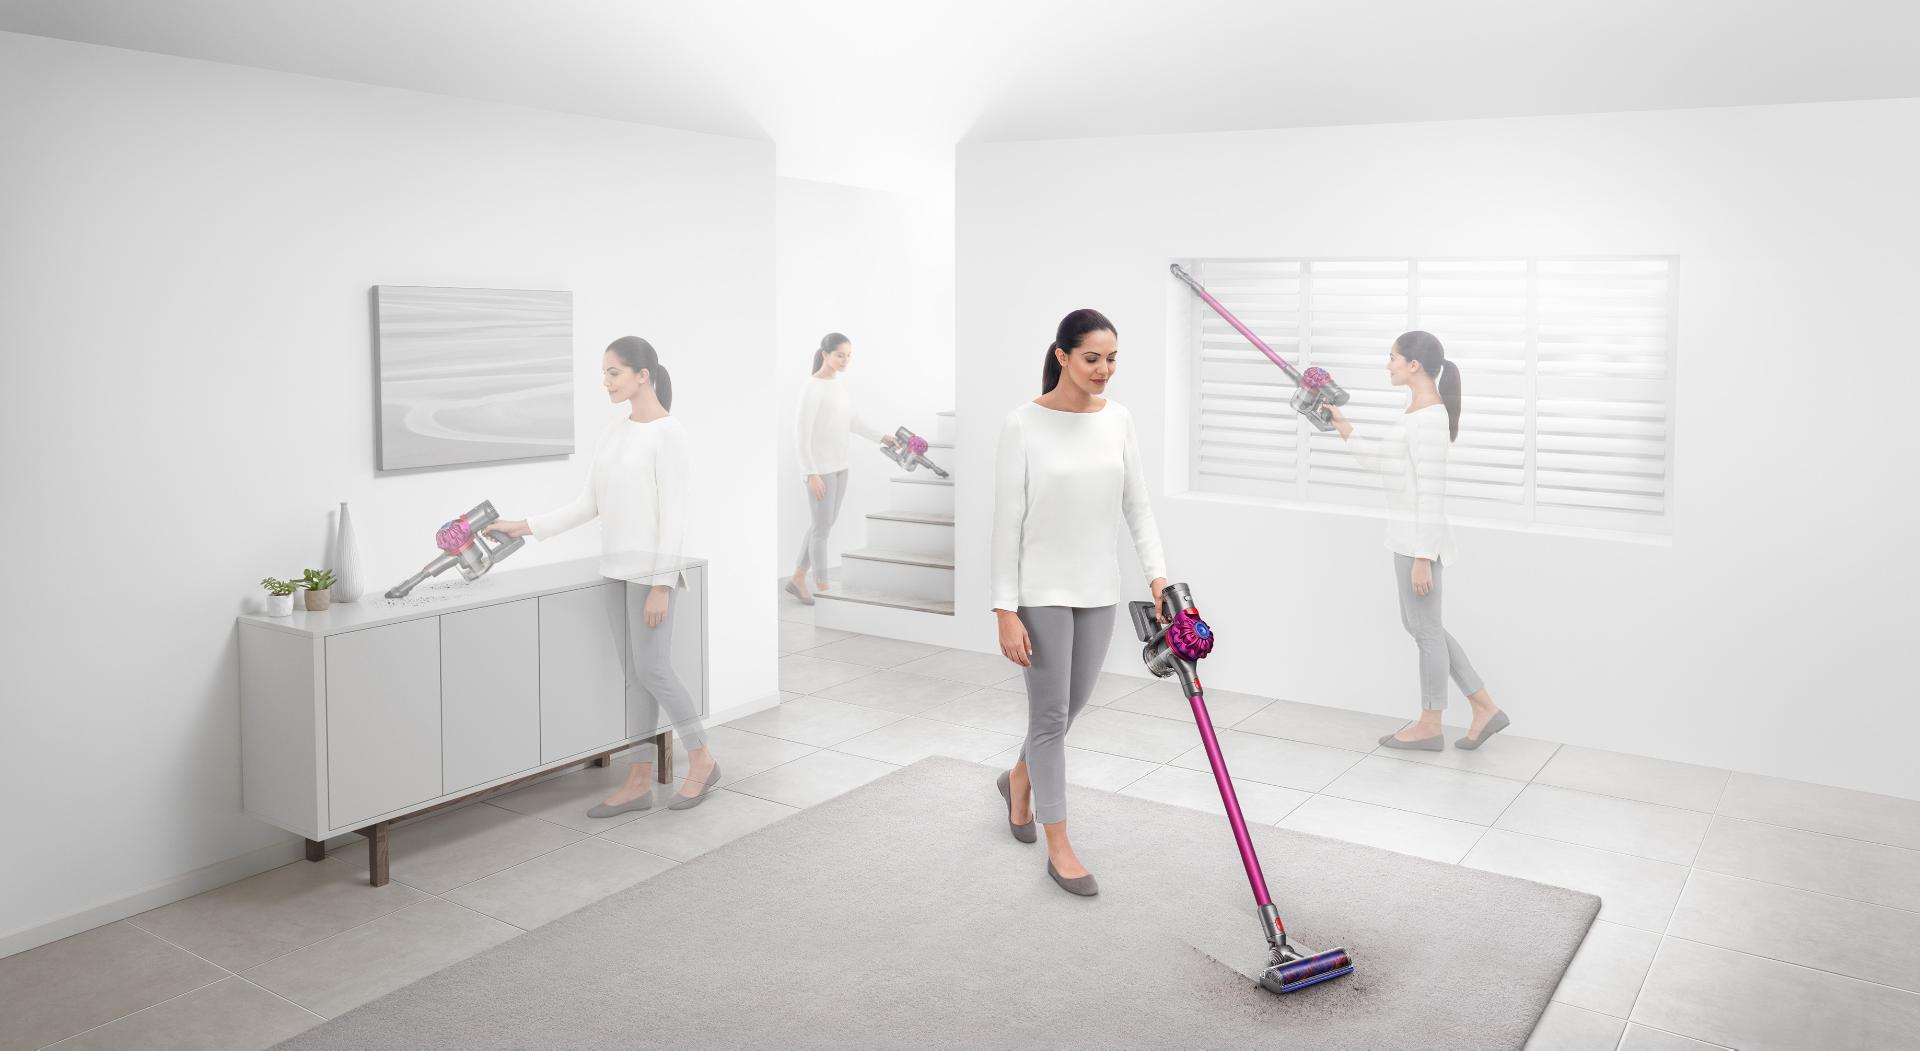 Model using Dyson cord-free vacuum